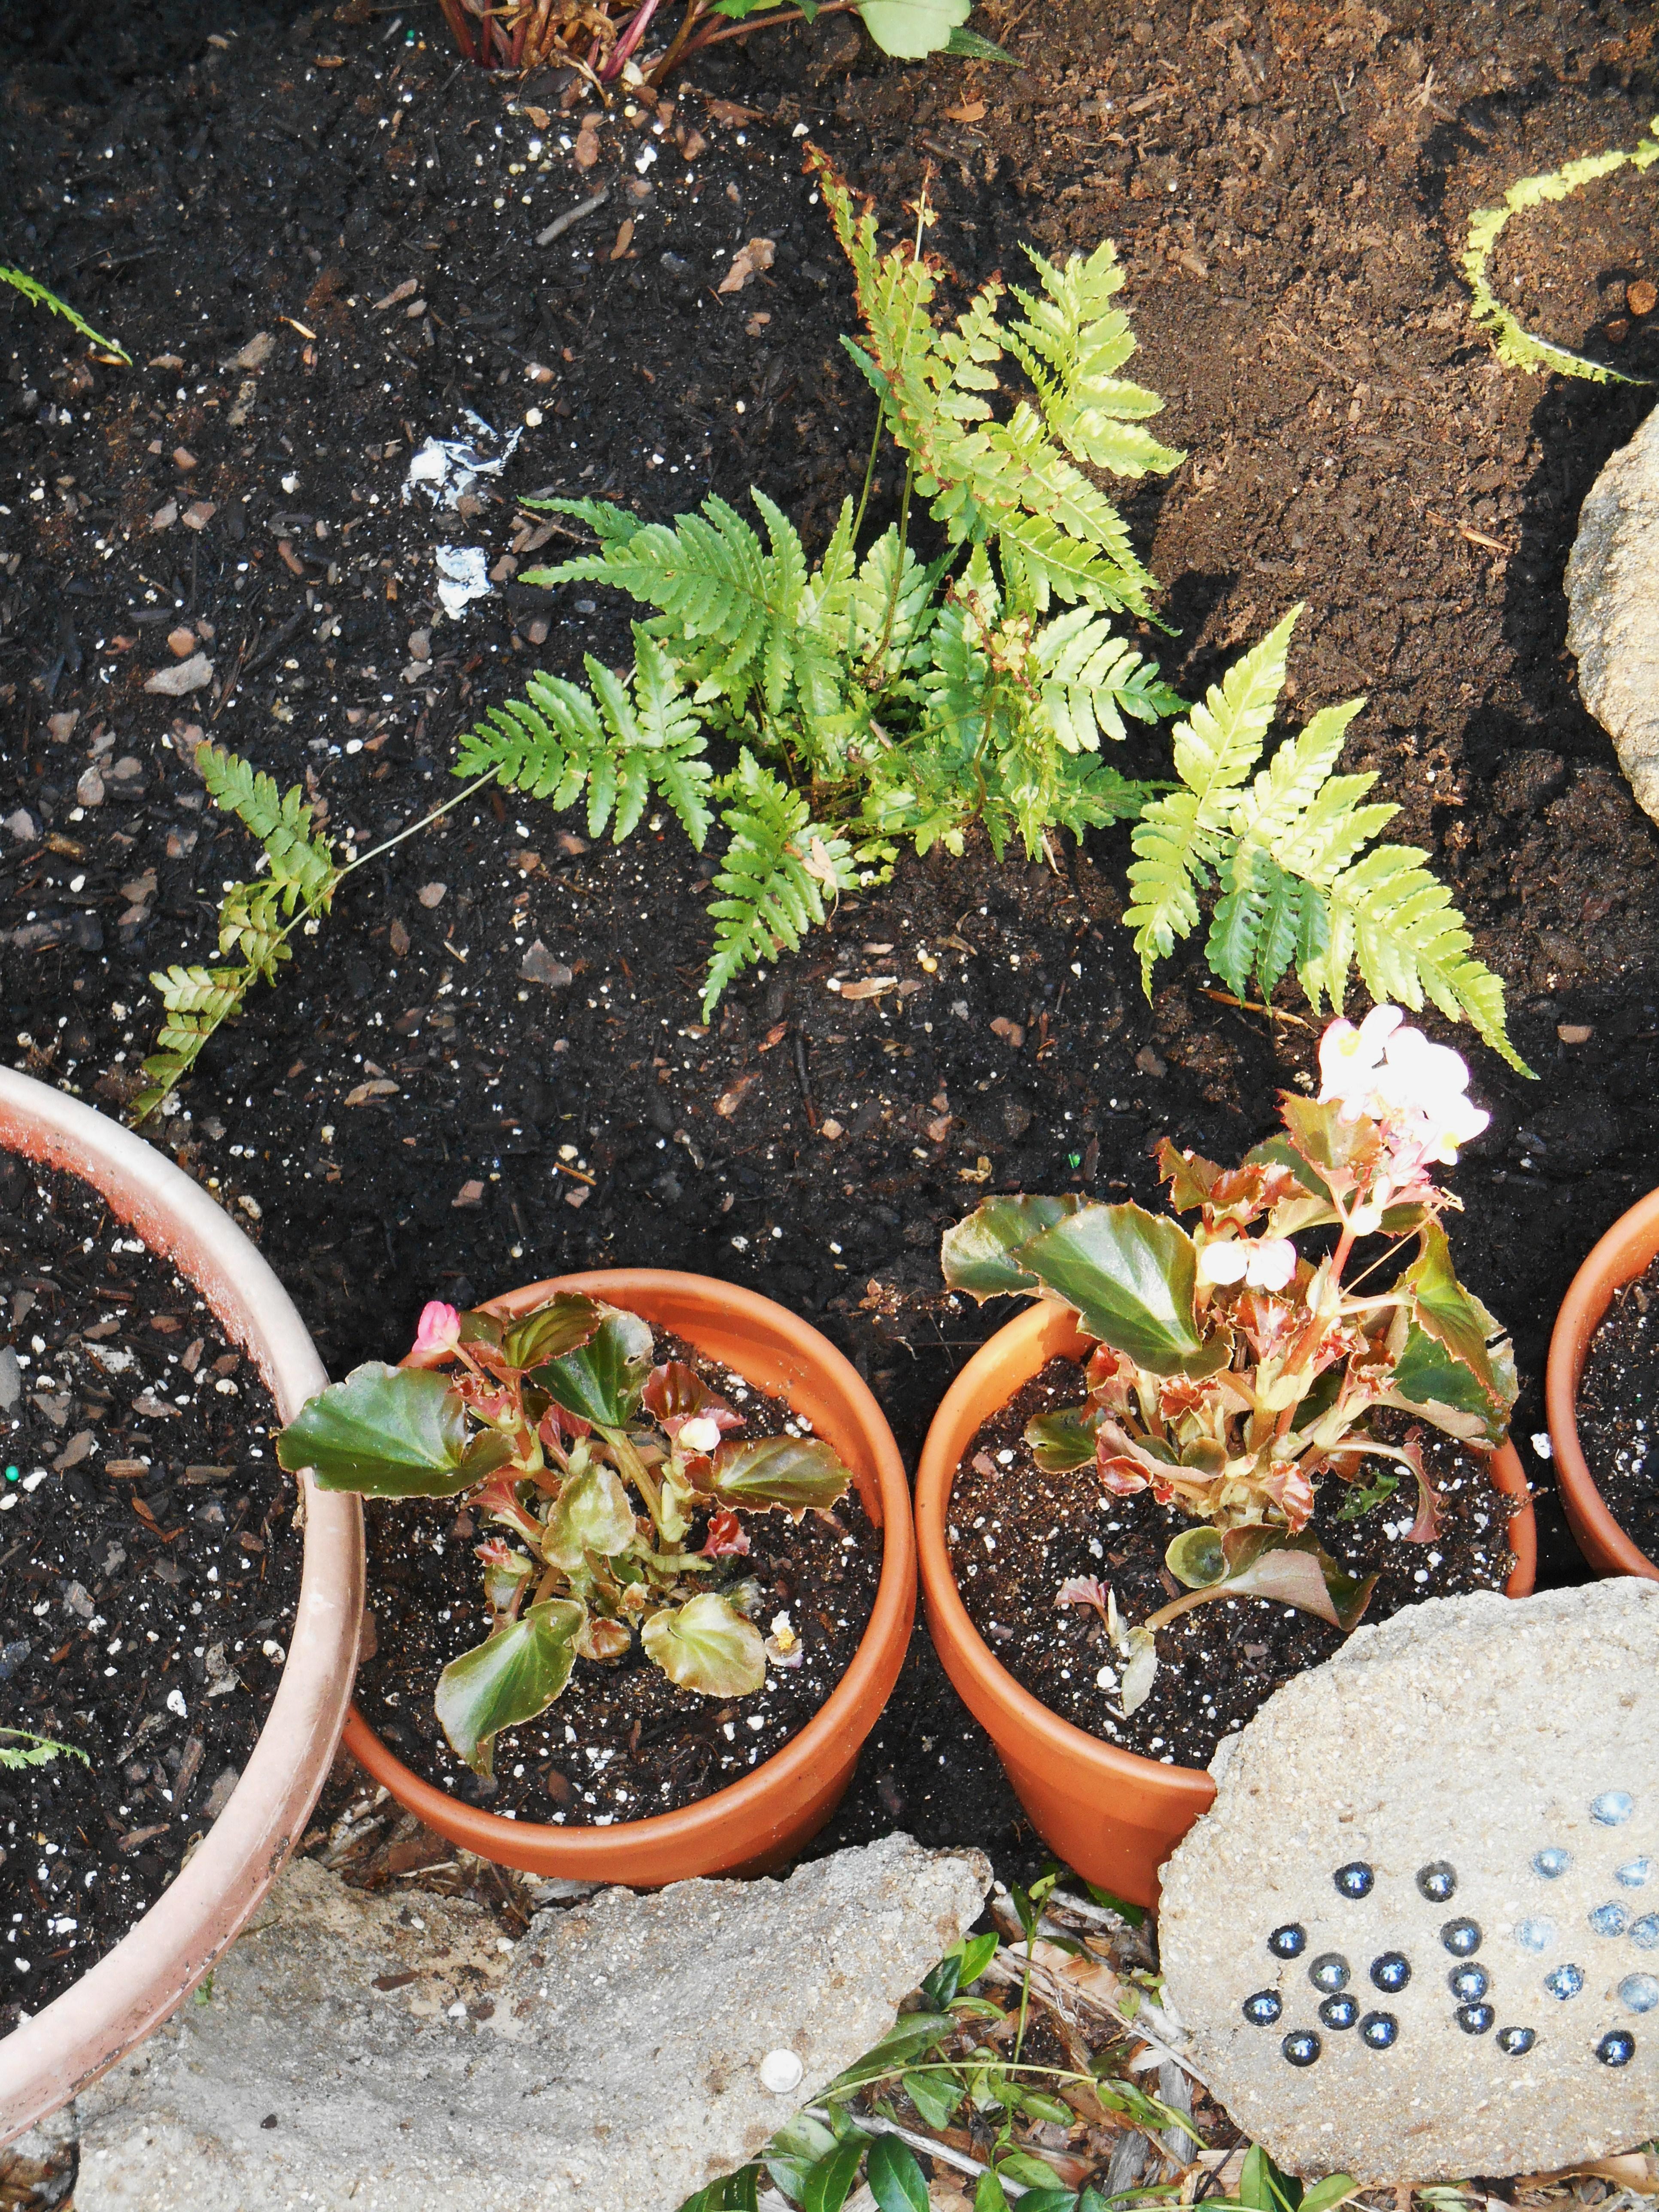 May 19, 2014 new raised bed fern garden 030